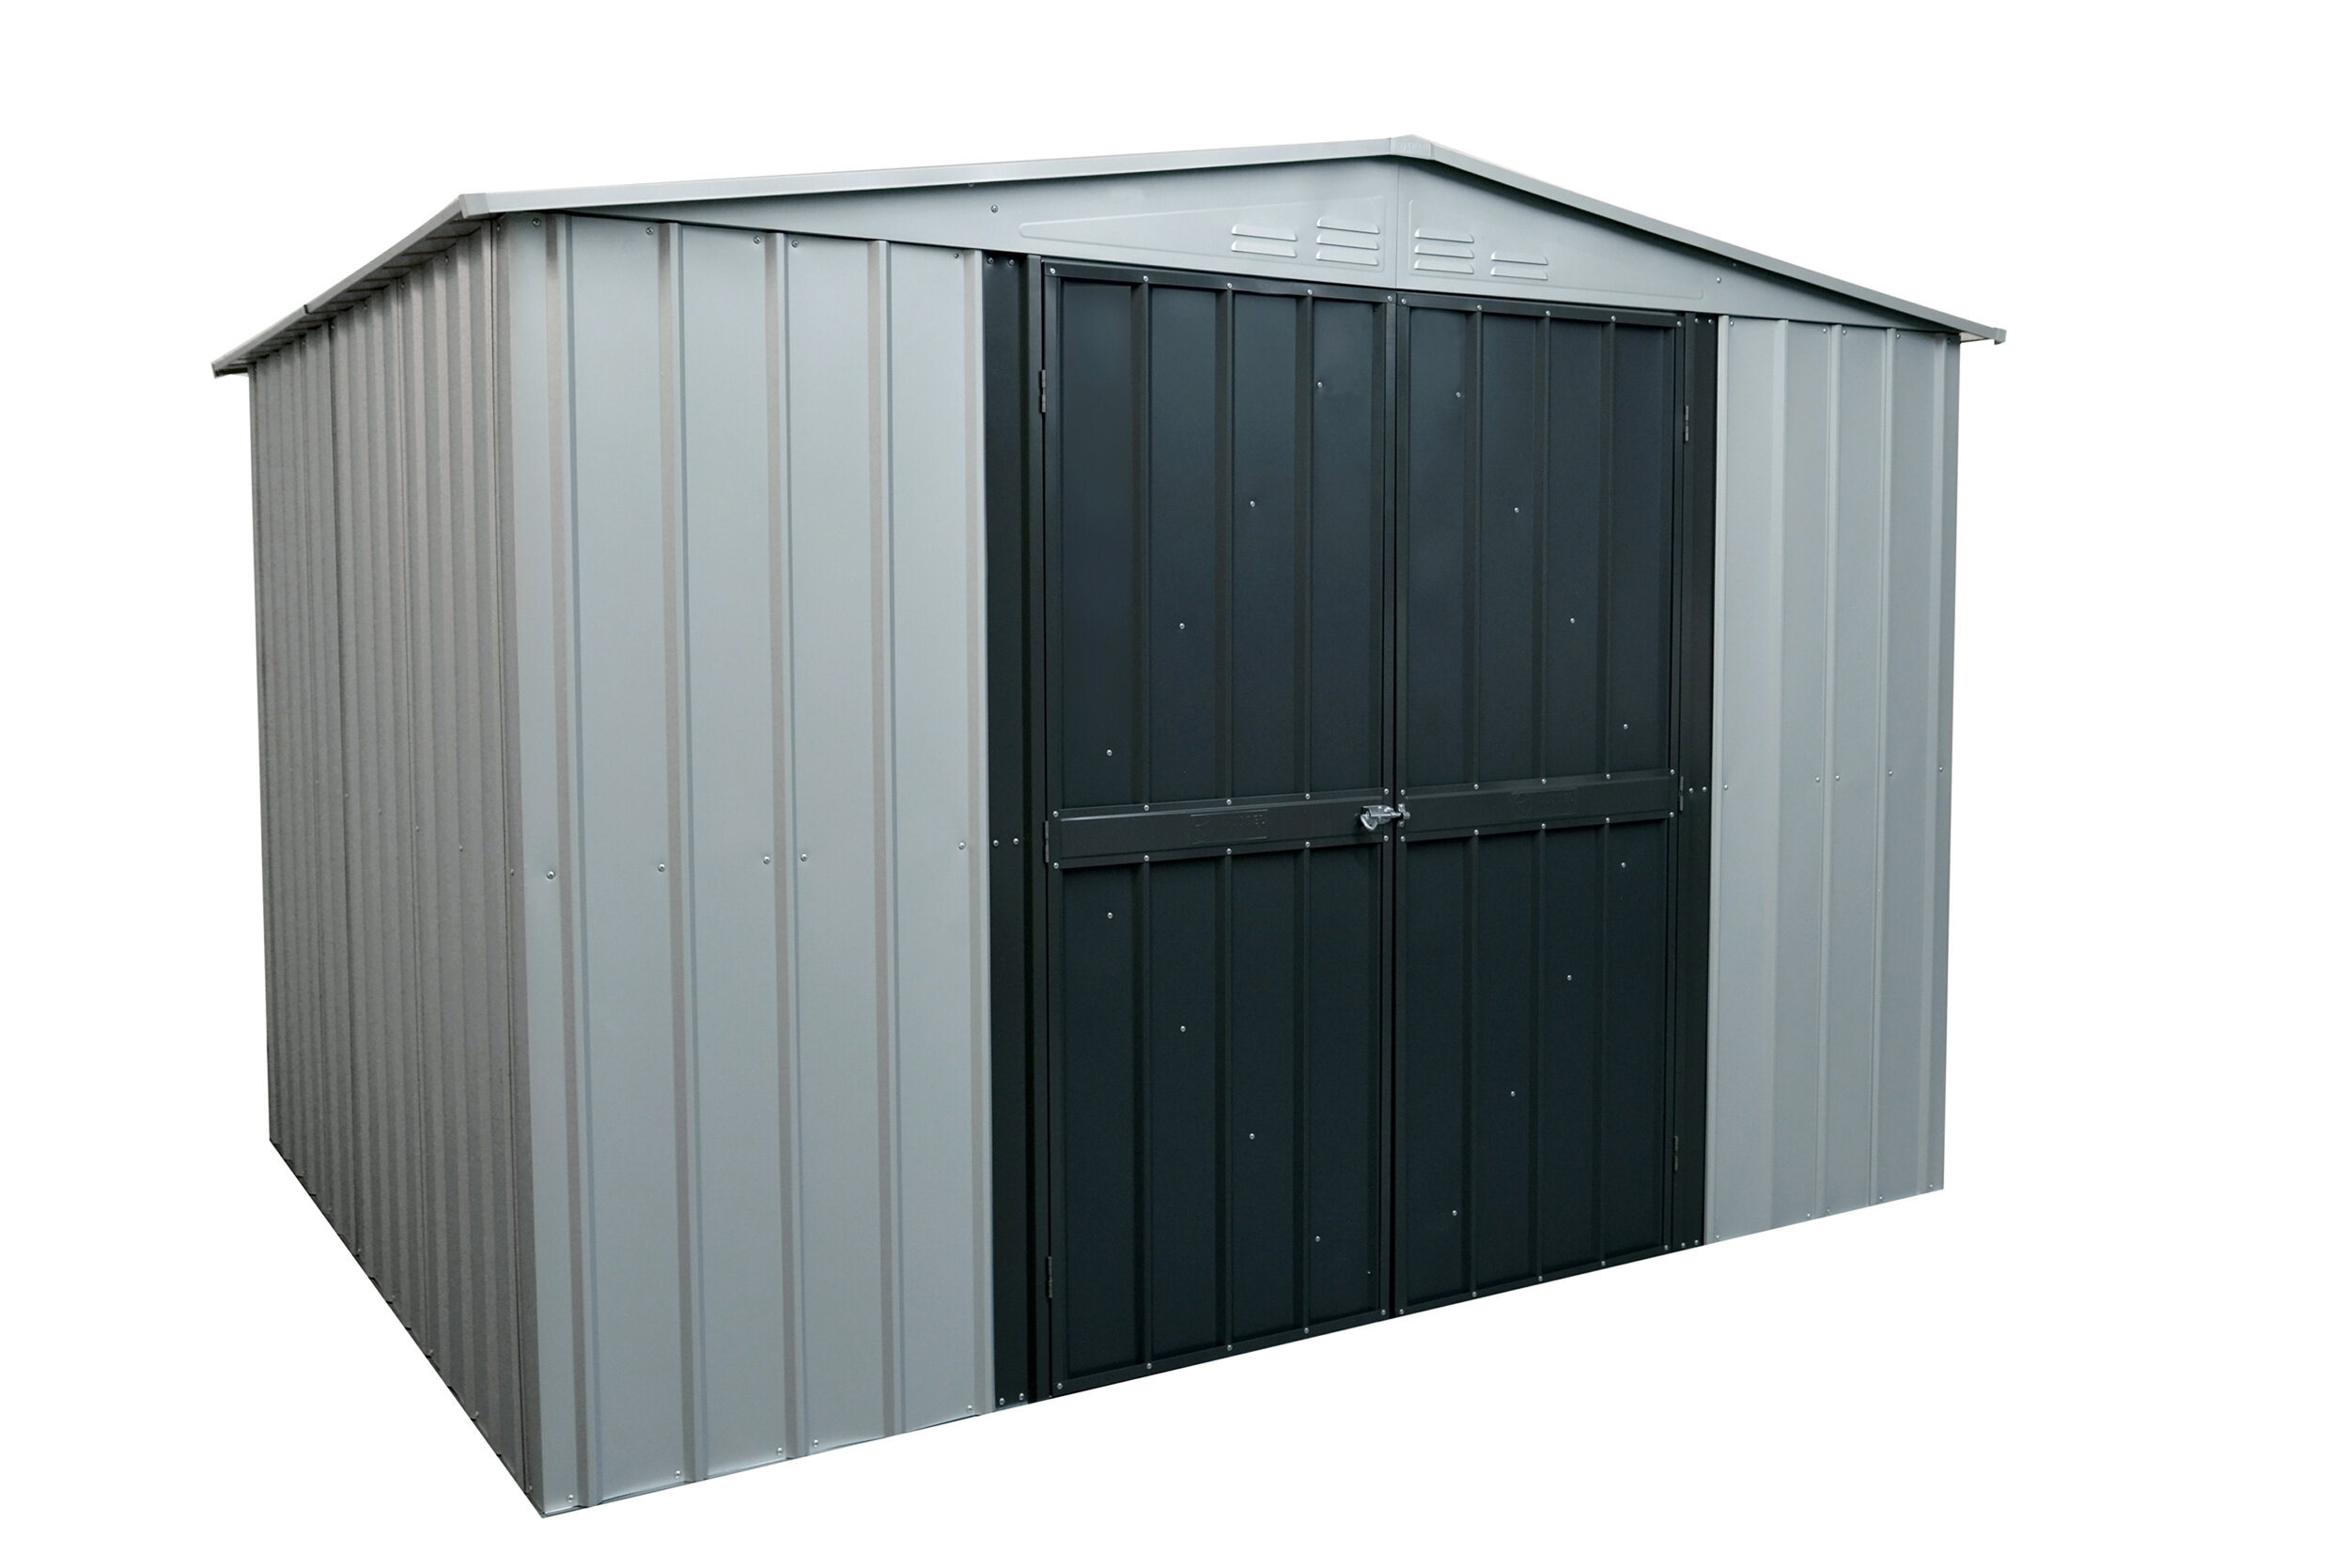 Globel Gable 7 Ft 8 In W X 5 9 D Galvanized Steel Storage Shed Wayfair